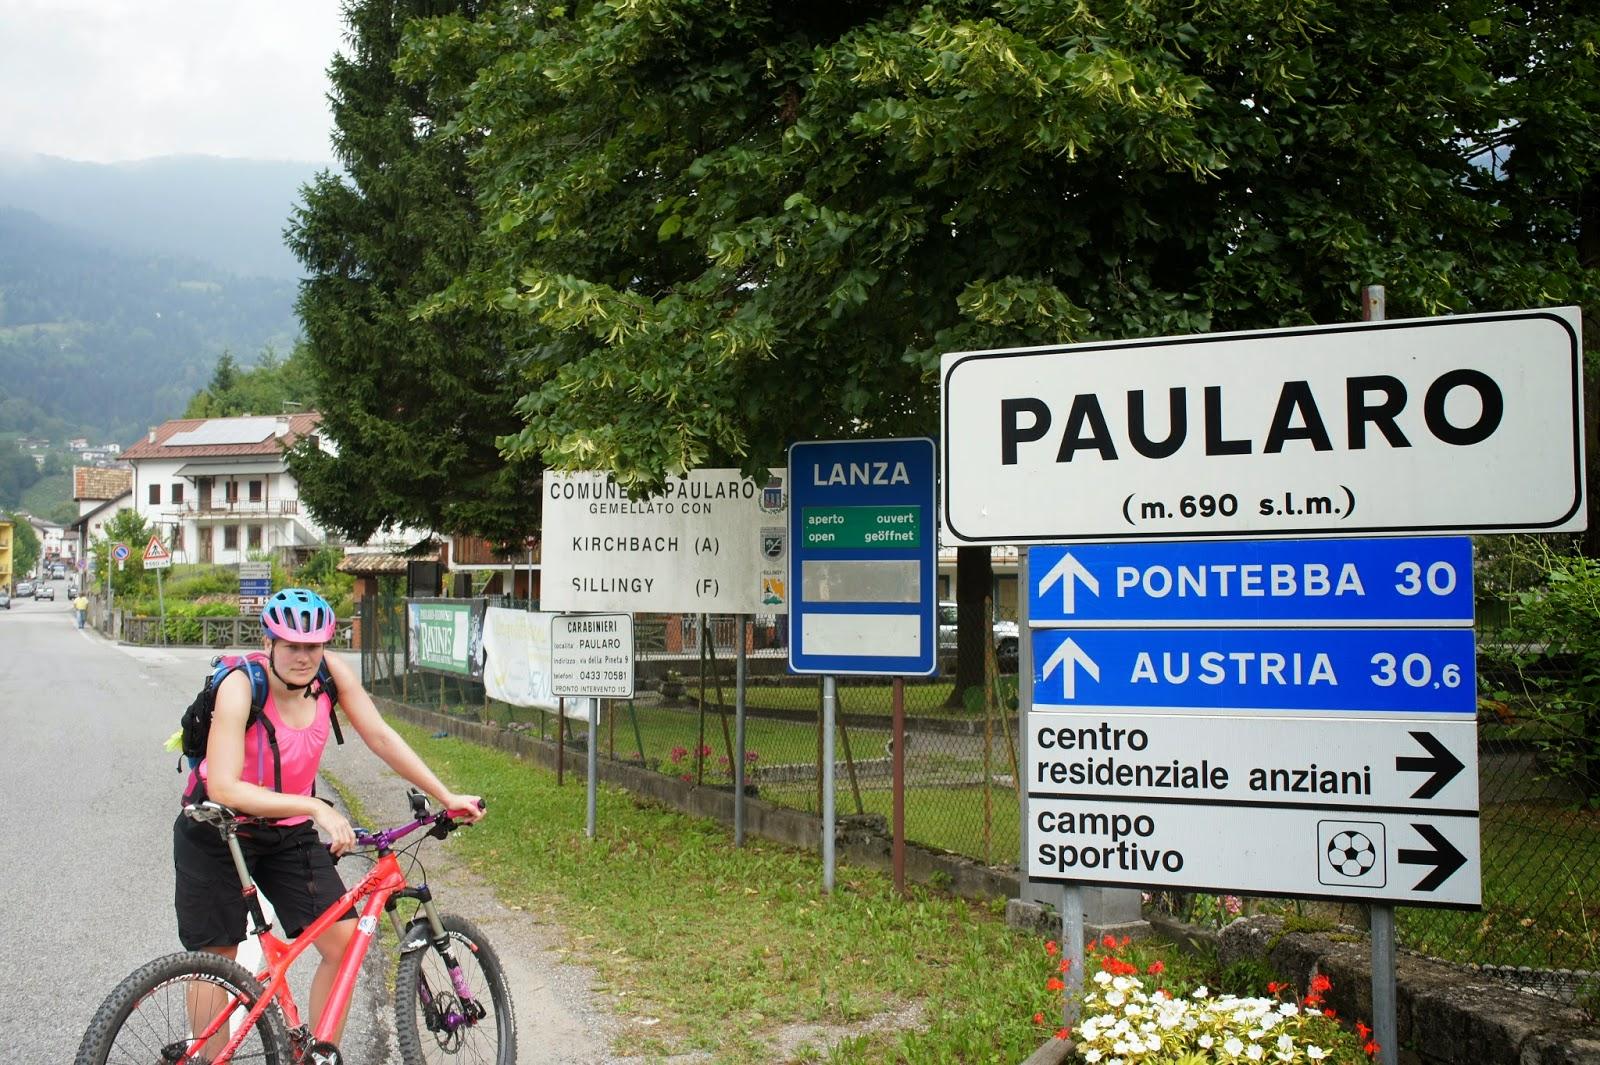 Mounainbike Routen Paularo Tolmezzo